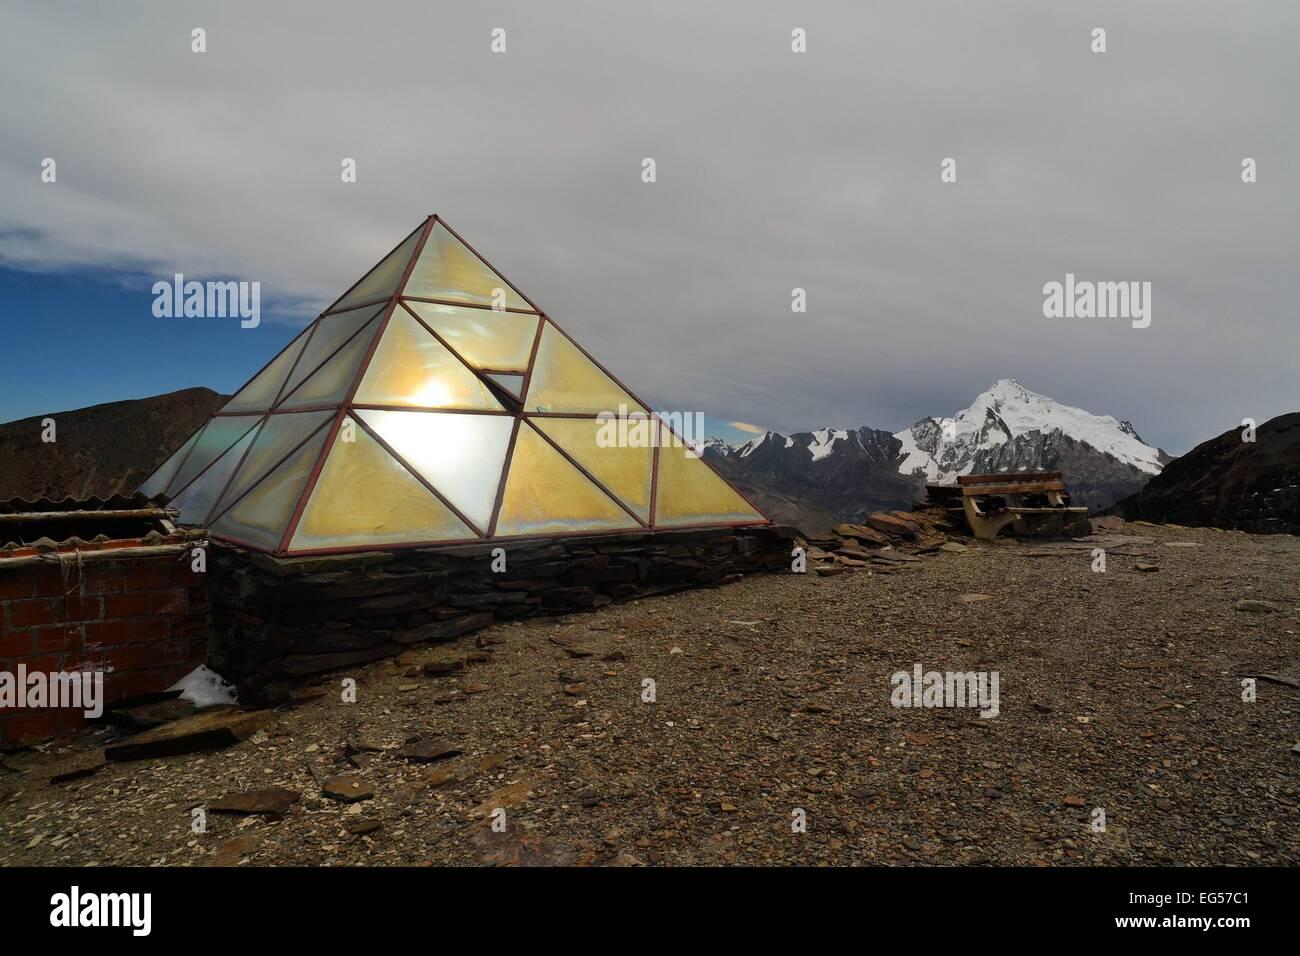 weather station on chacaltaya peak, highest ski resort in the world